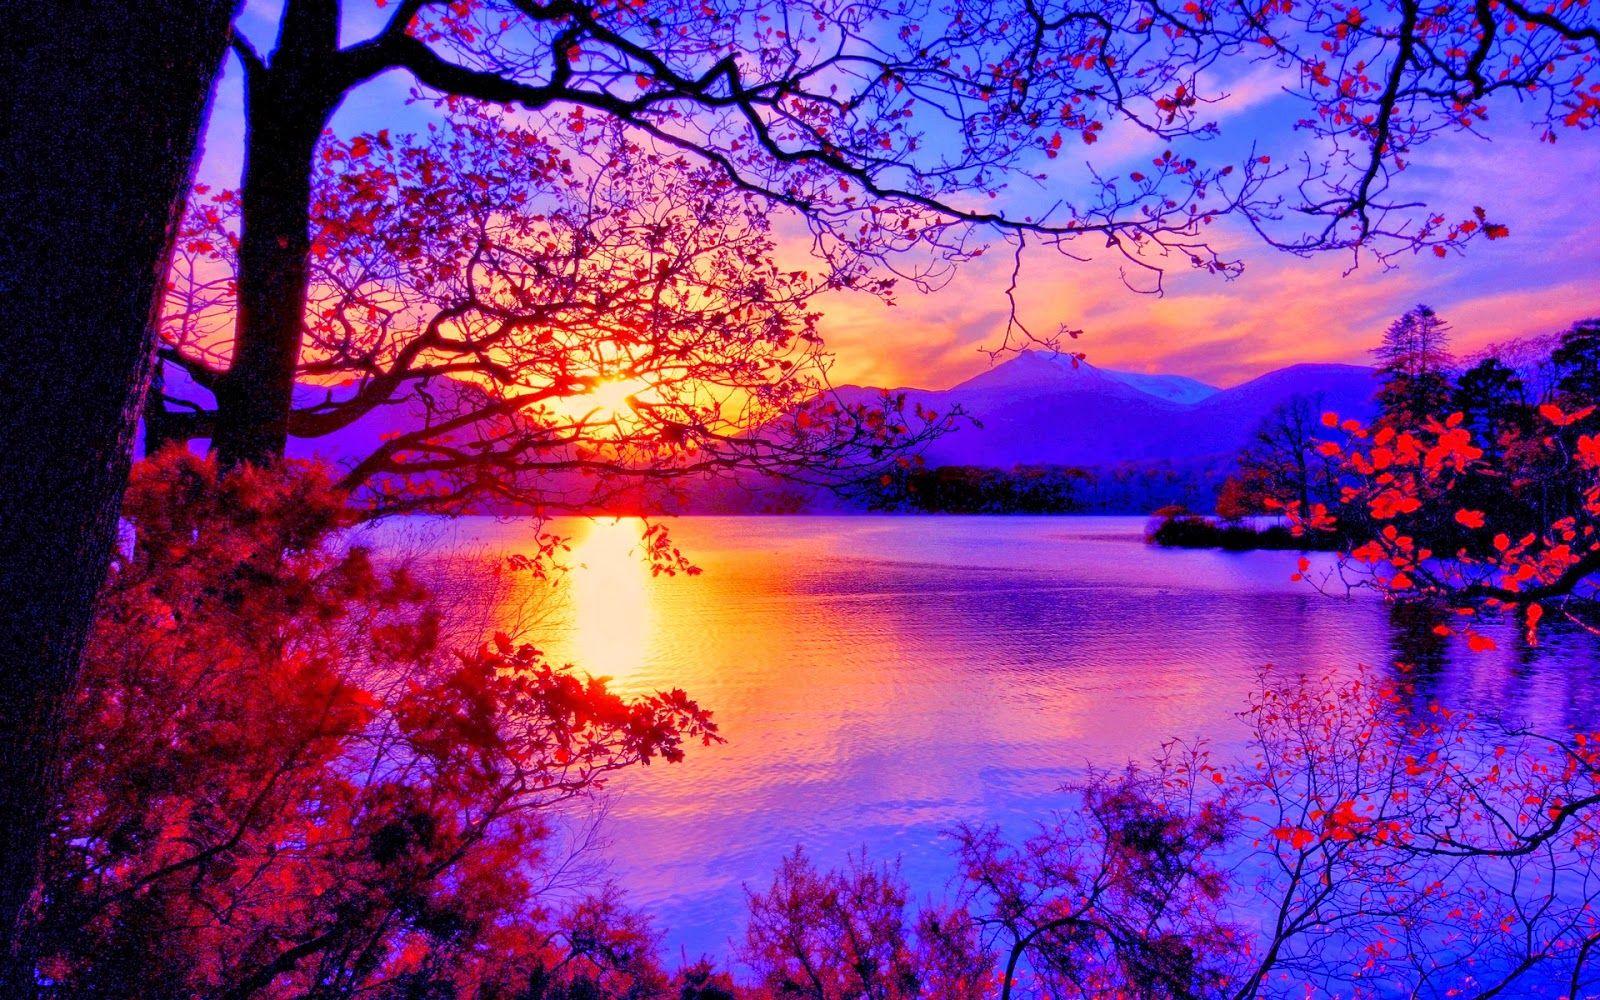 Image Result For Senary Autumn Landscape Scenery Background Beautiful Sunrise